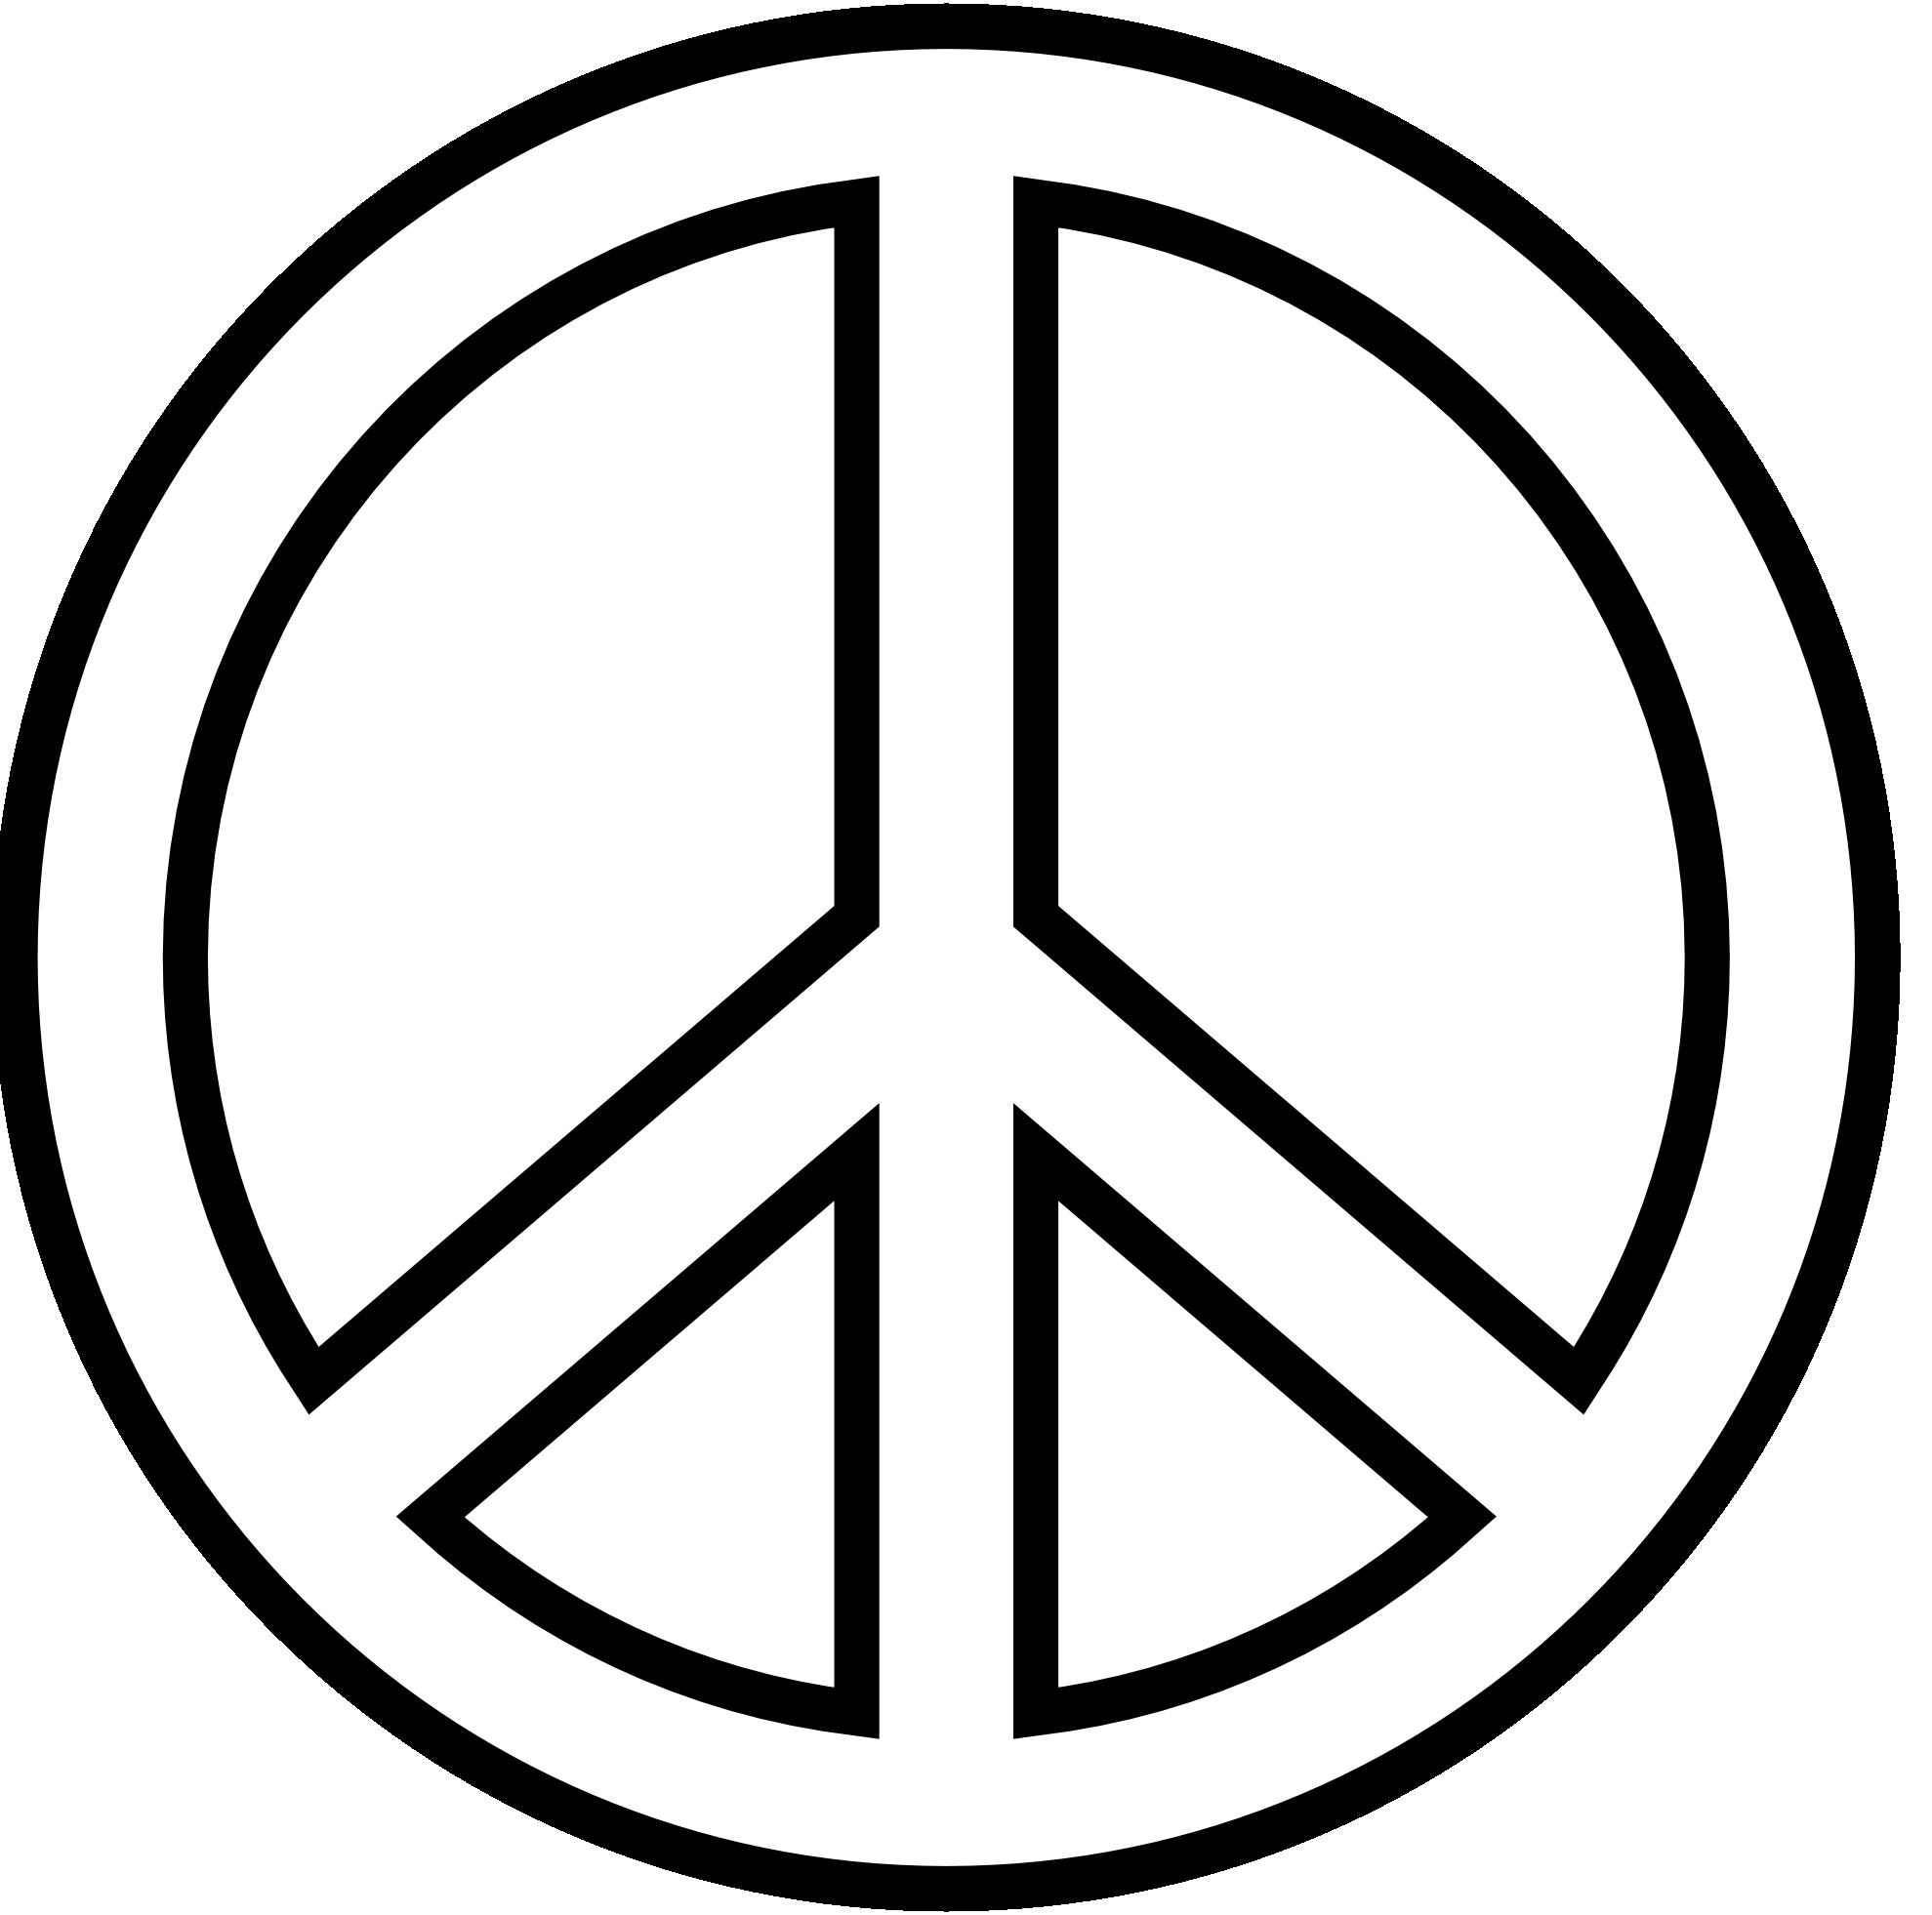 Drawn peace sign jari Blue Peace peace – Photos